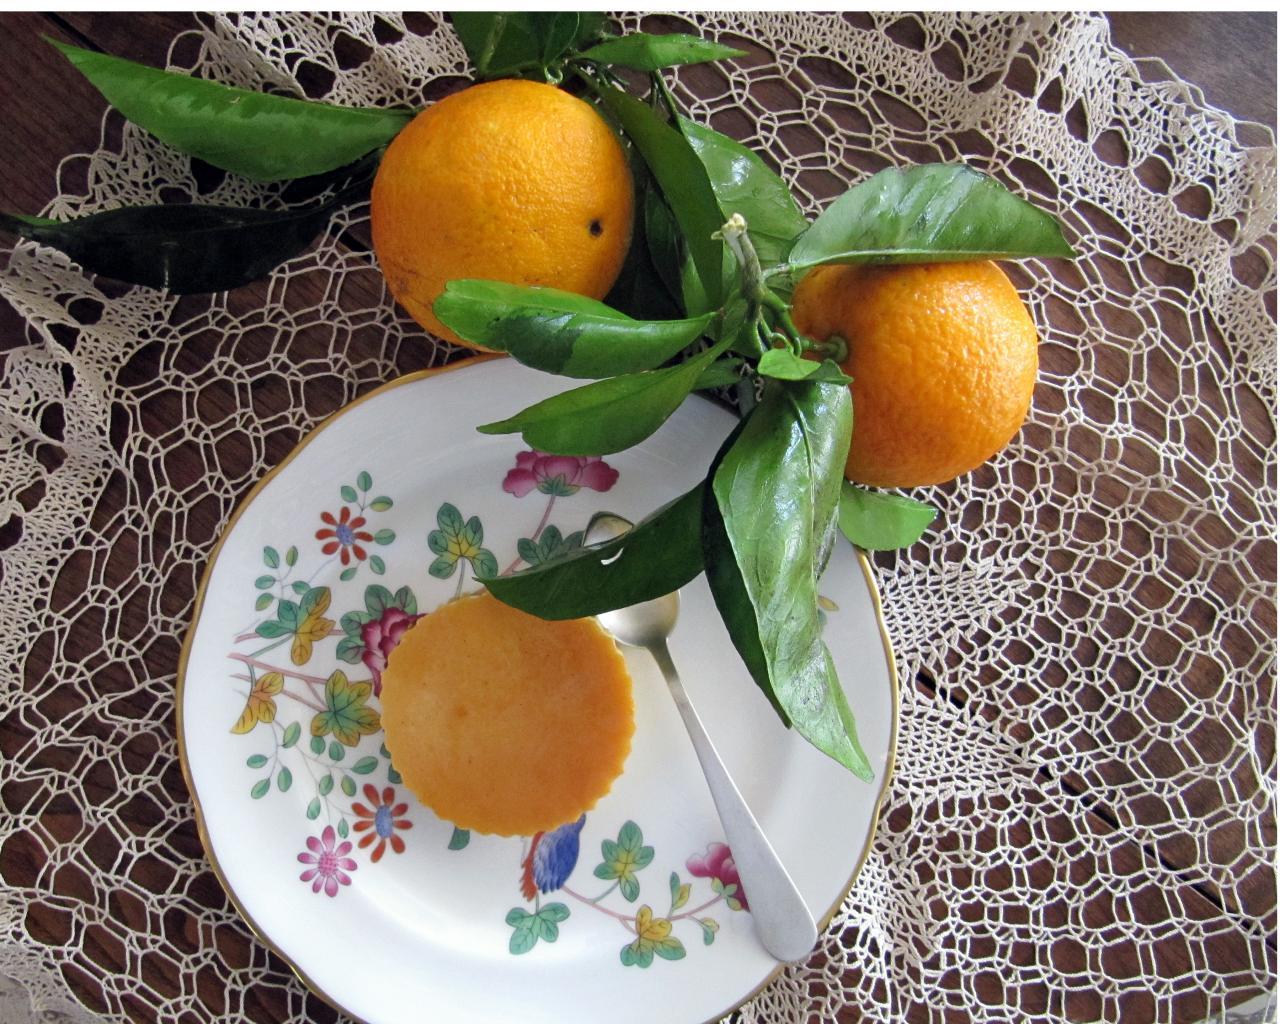 Flan of Orange from Soller